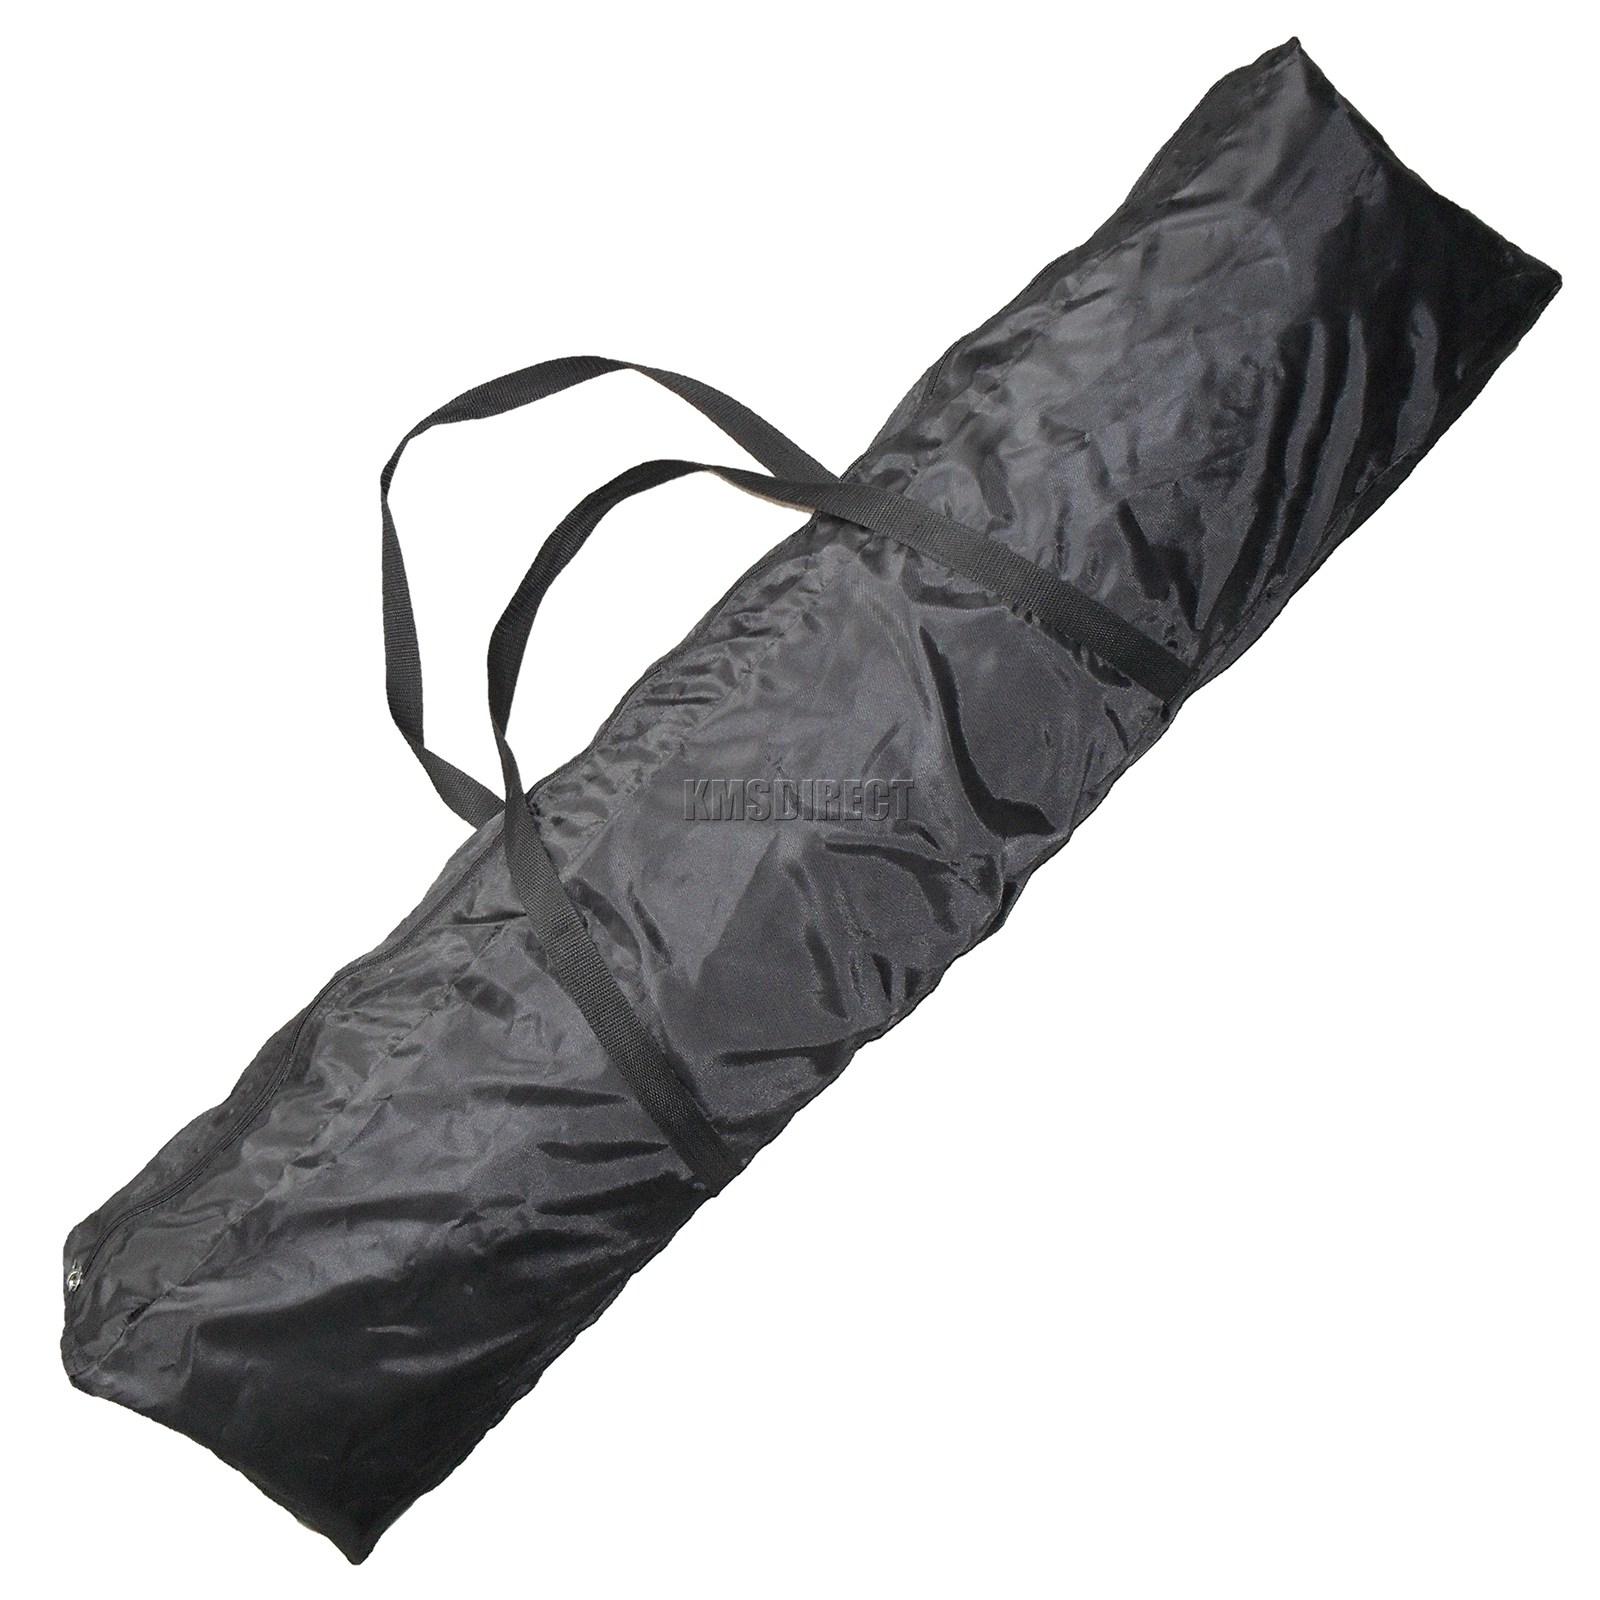 Indoor-Portable-Grow-Tent-Box-Silver-Mylar-Hydroponics-Bud-Green-Room-New-Design miniatuur 18